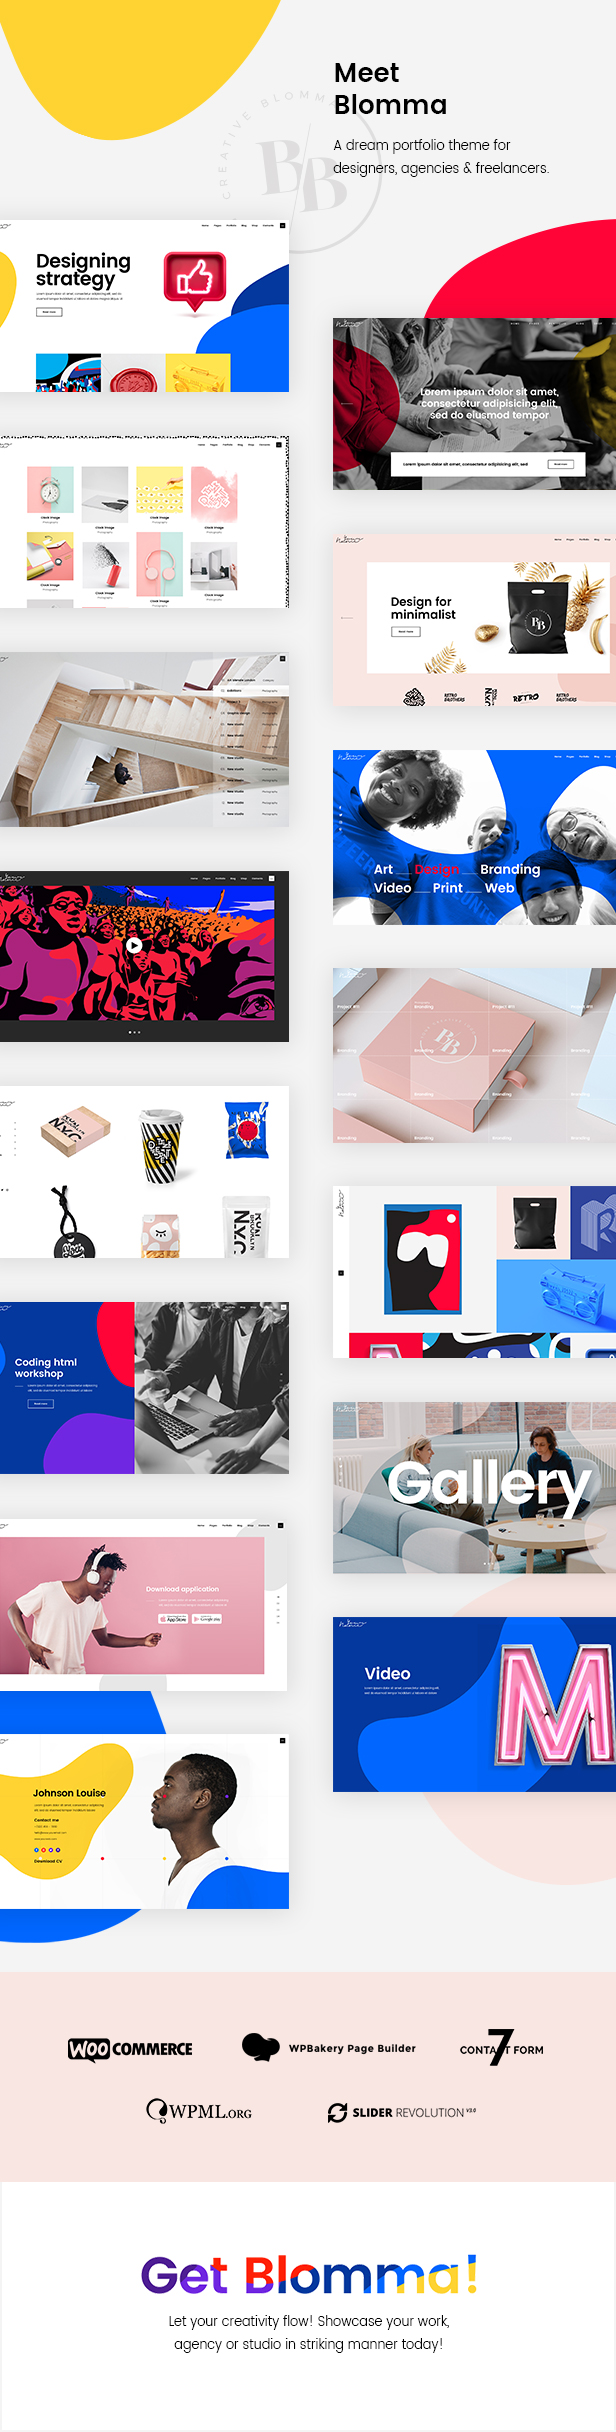 Blomma - Creative Agency Portfolio Theme - 1